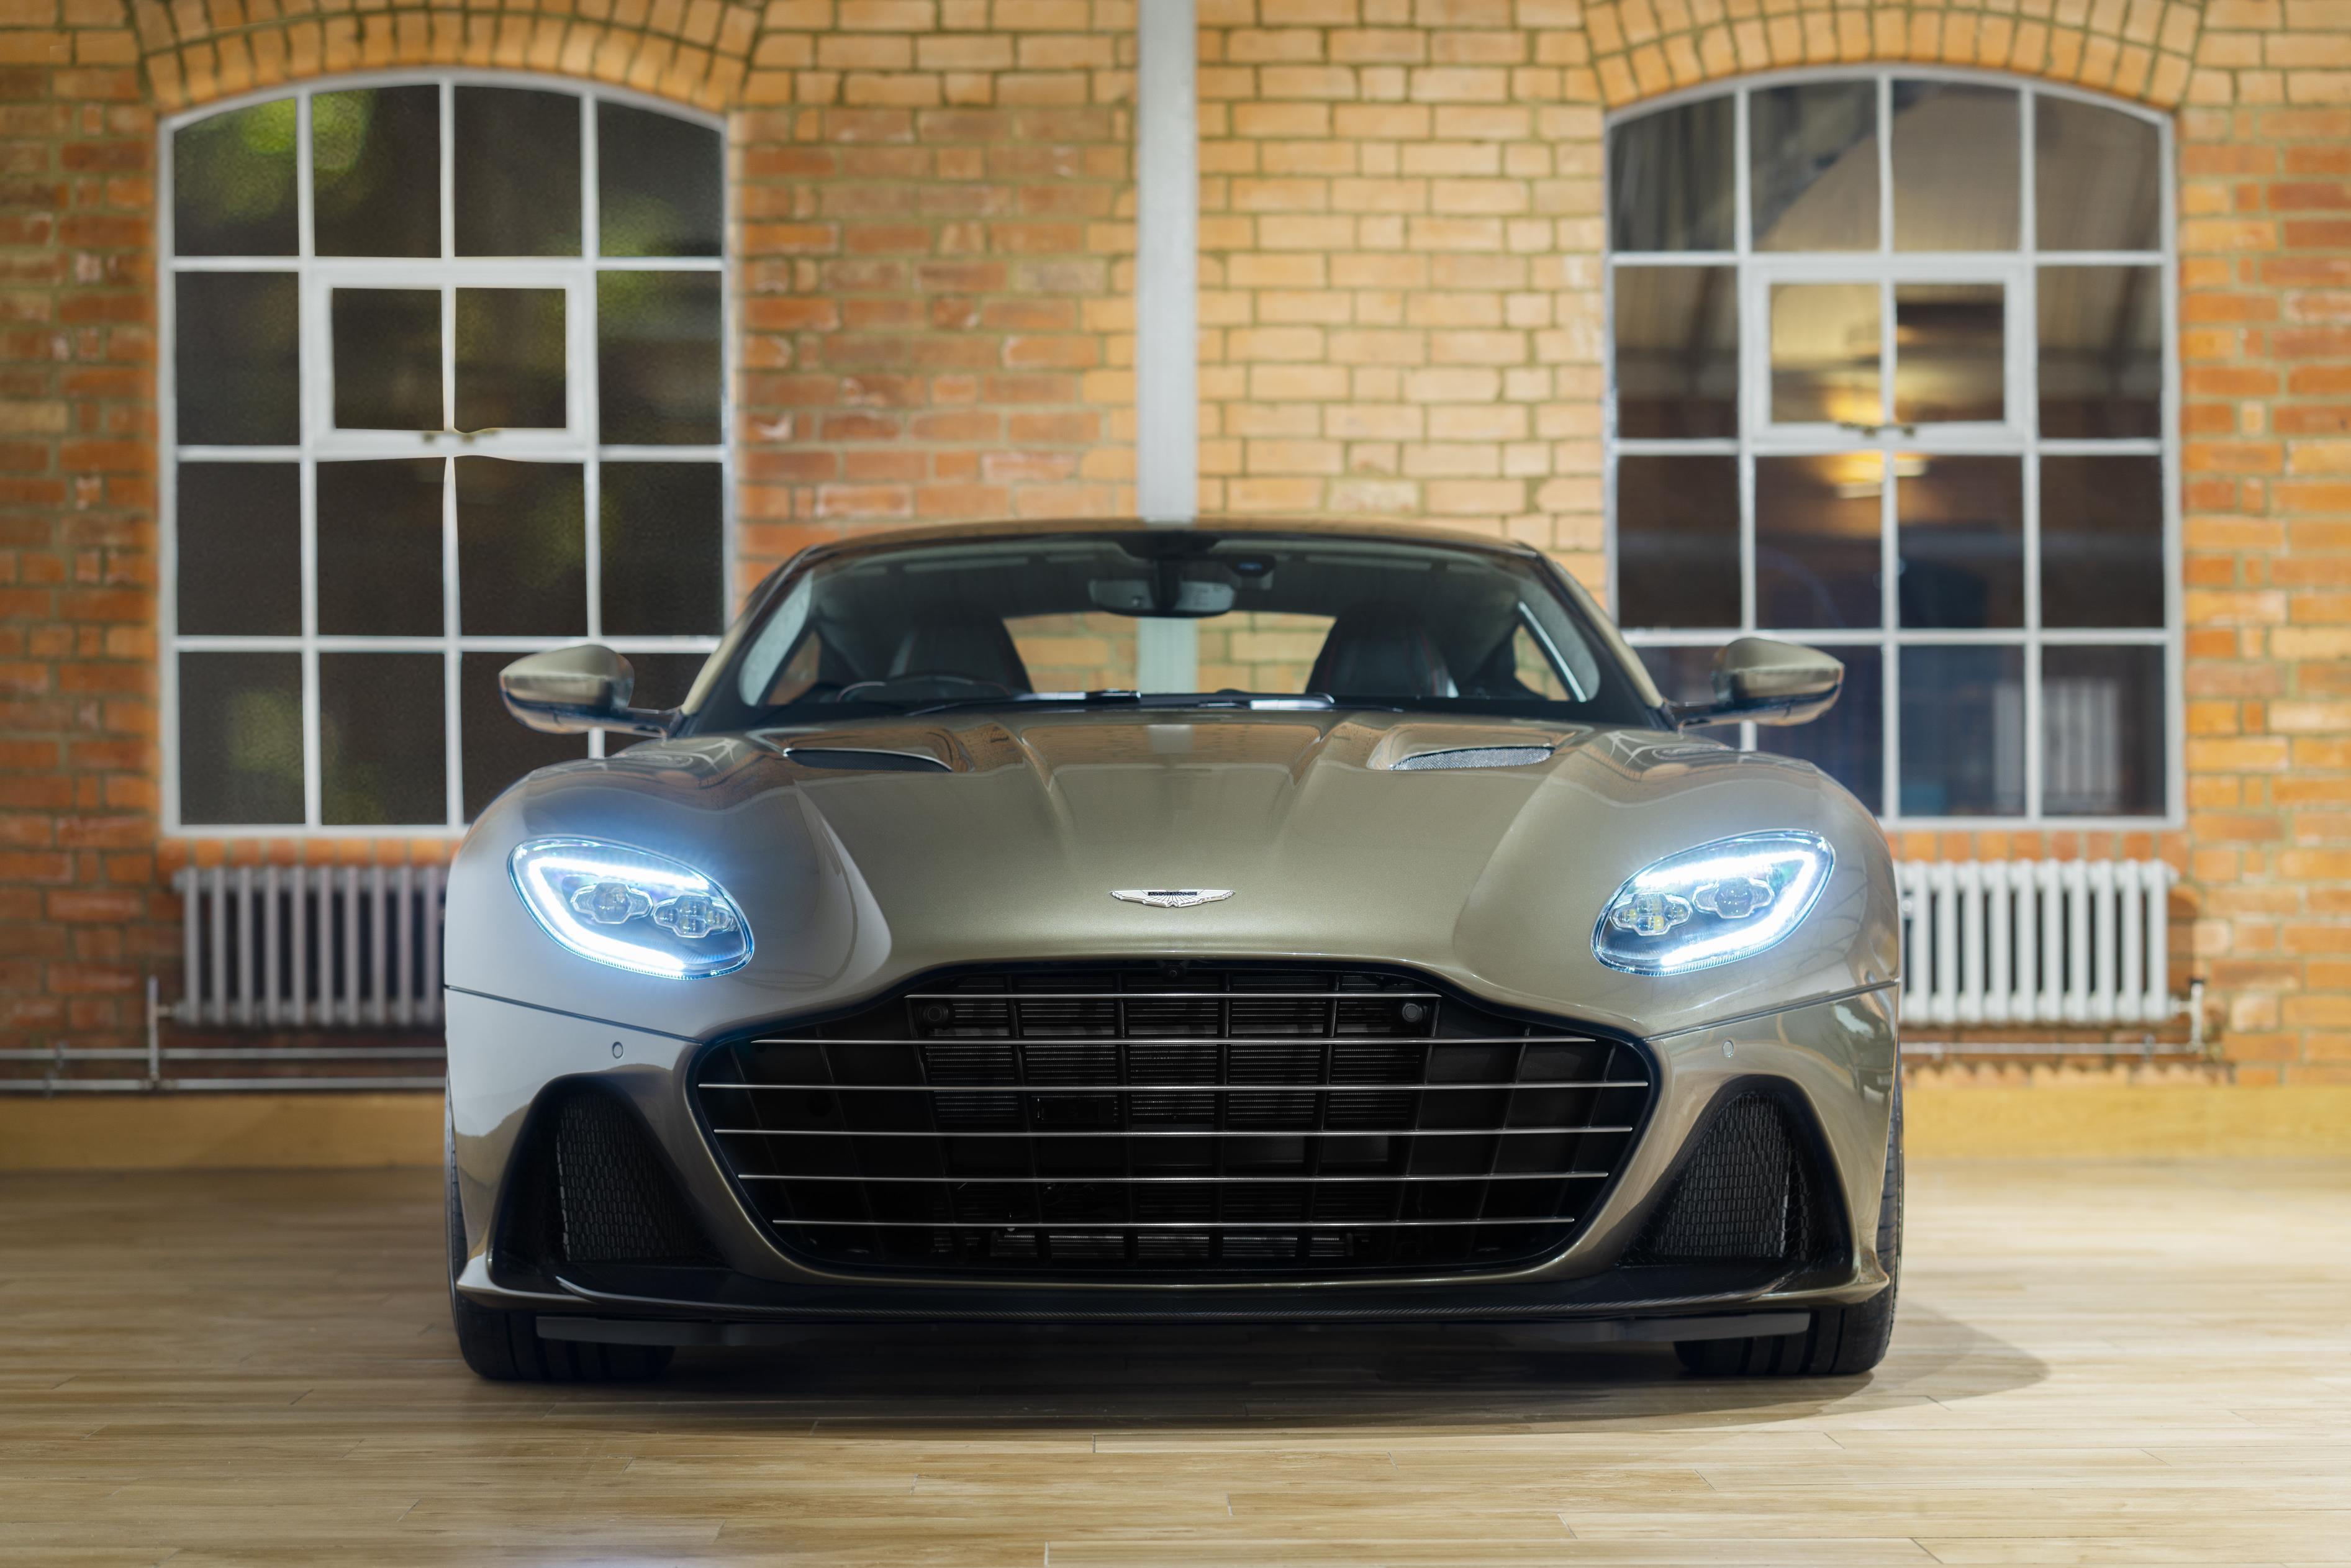 Aston Martin DBS Superleggera Front View